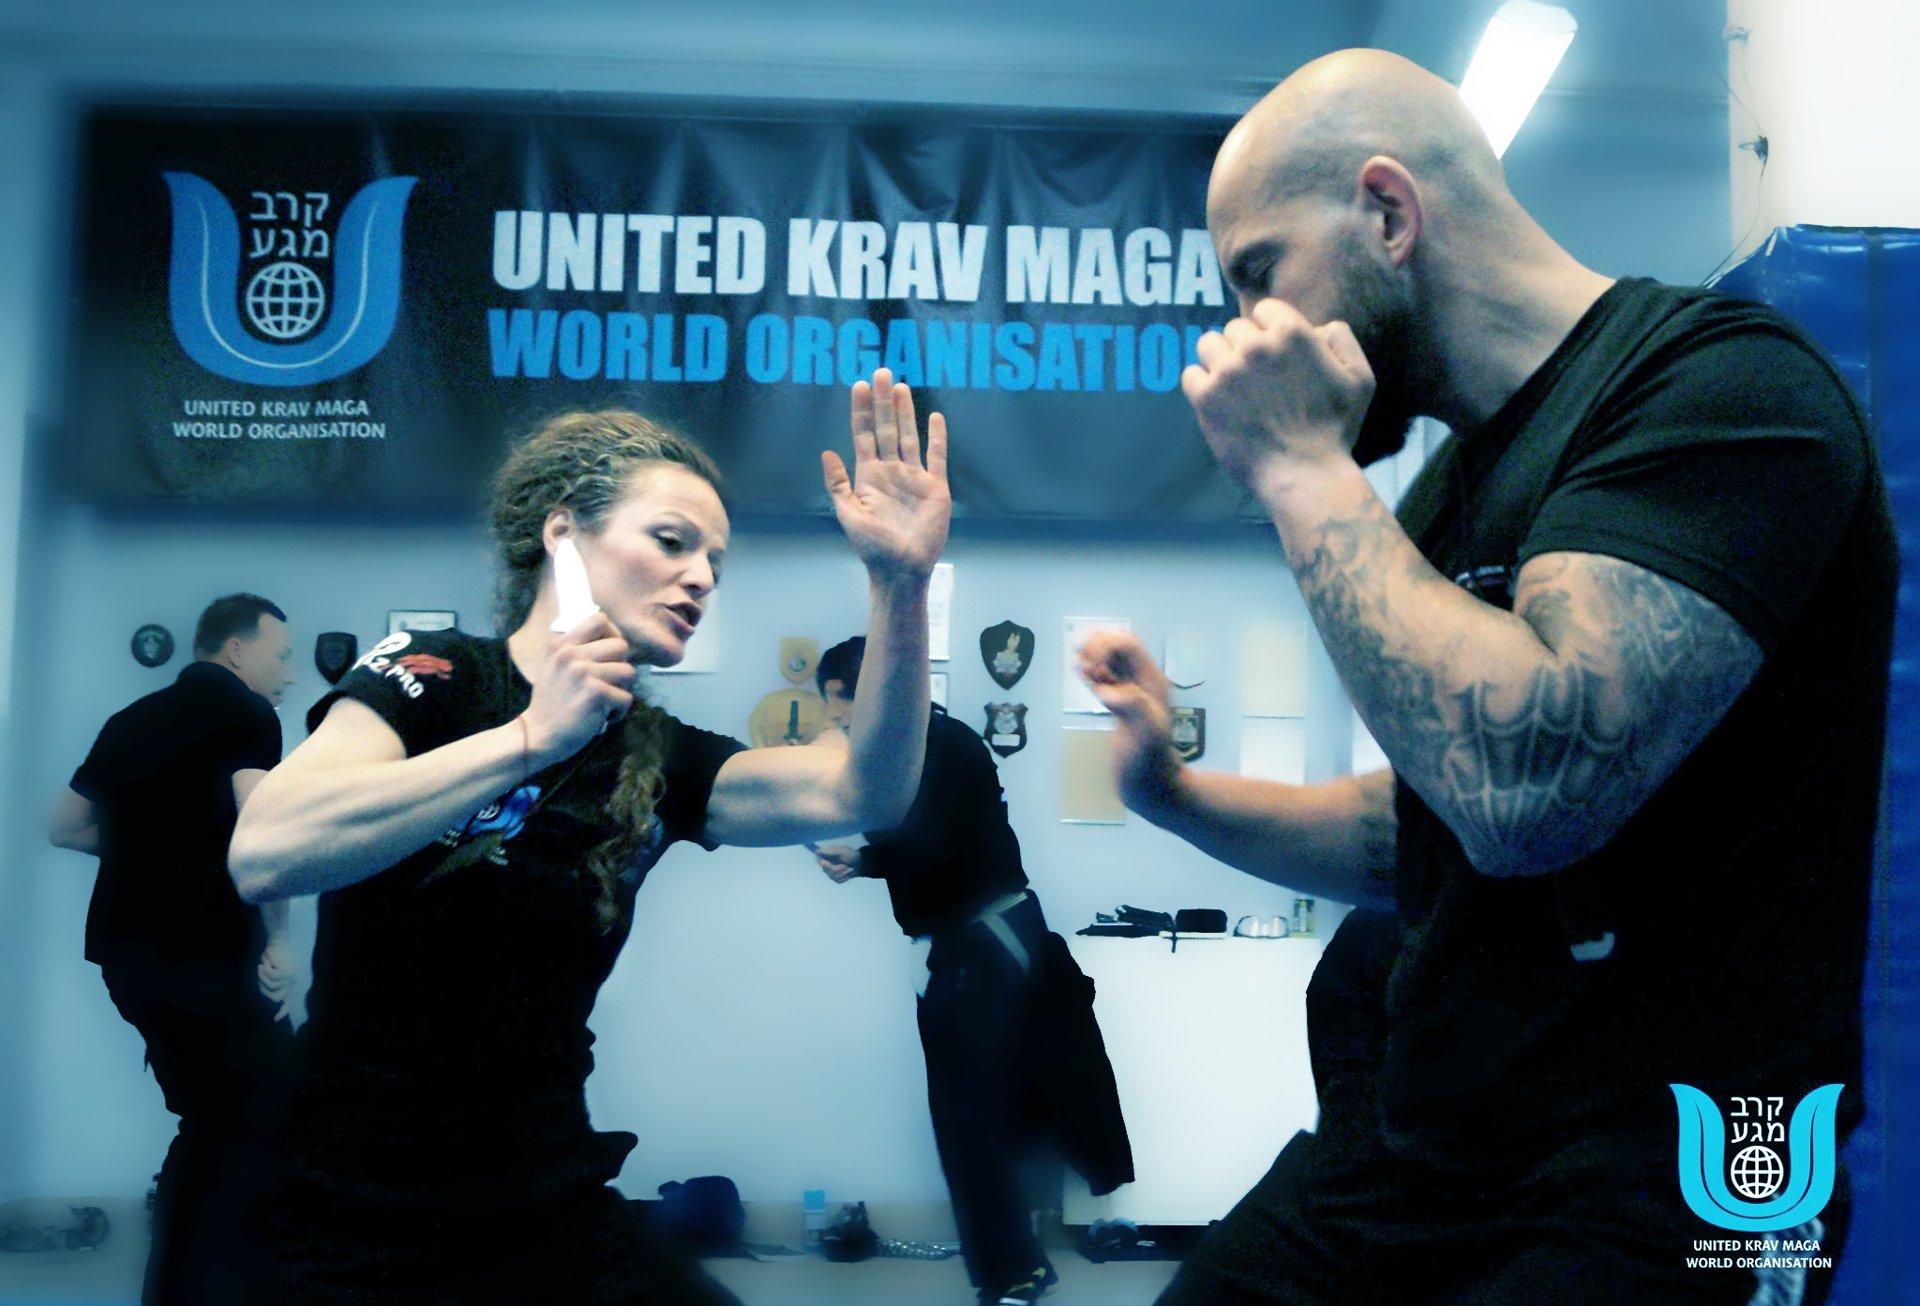 self defense training in edinburgh united krav maga. Black Bedroom Furniture Sets. Home Design Ideas